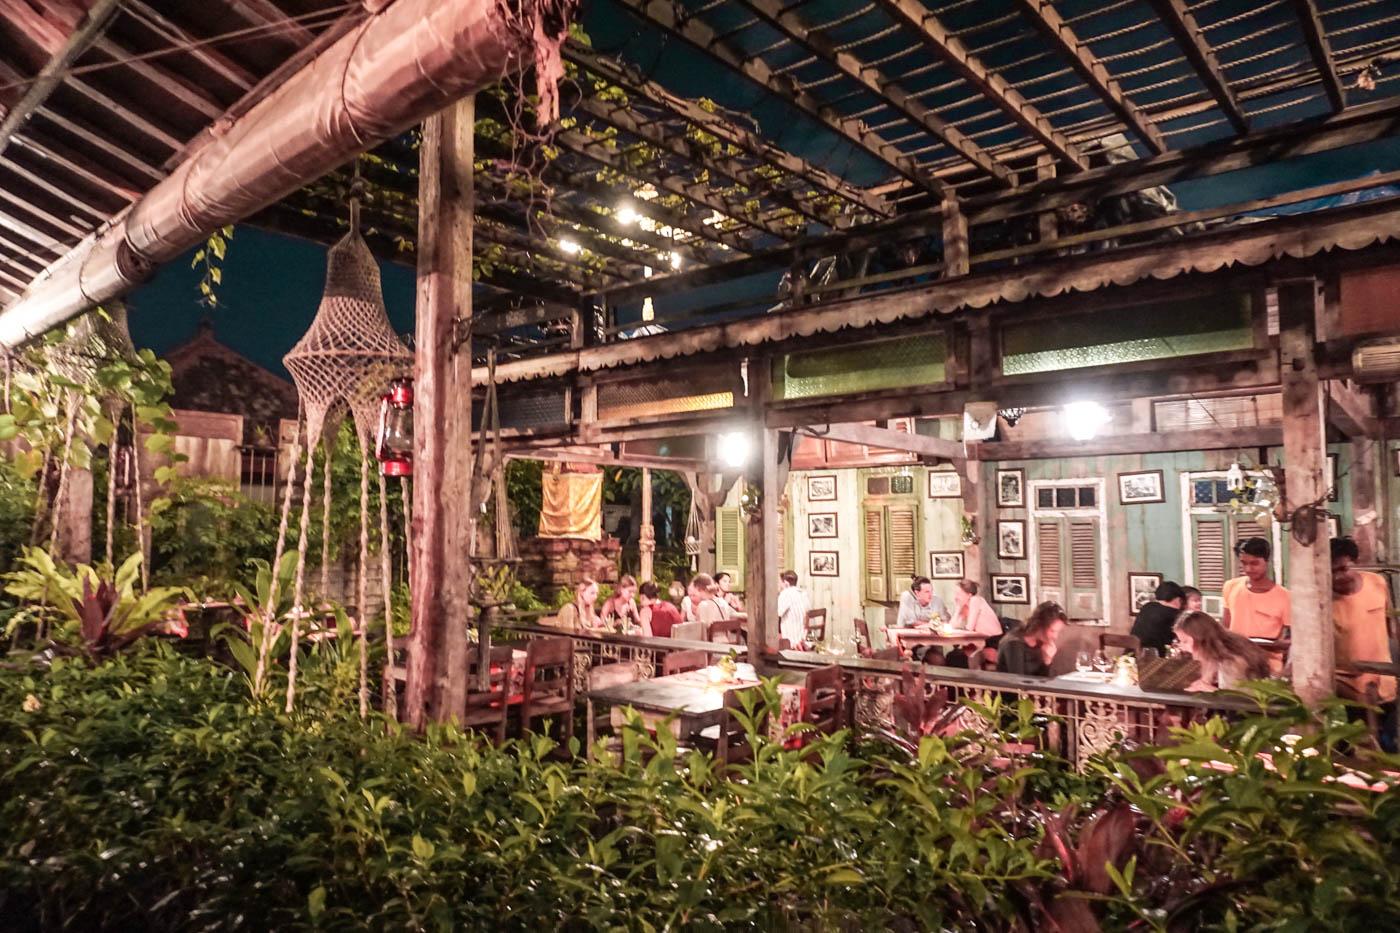 Warung Dandelion - a cute restaurant in Canggu